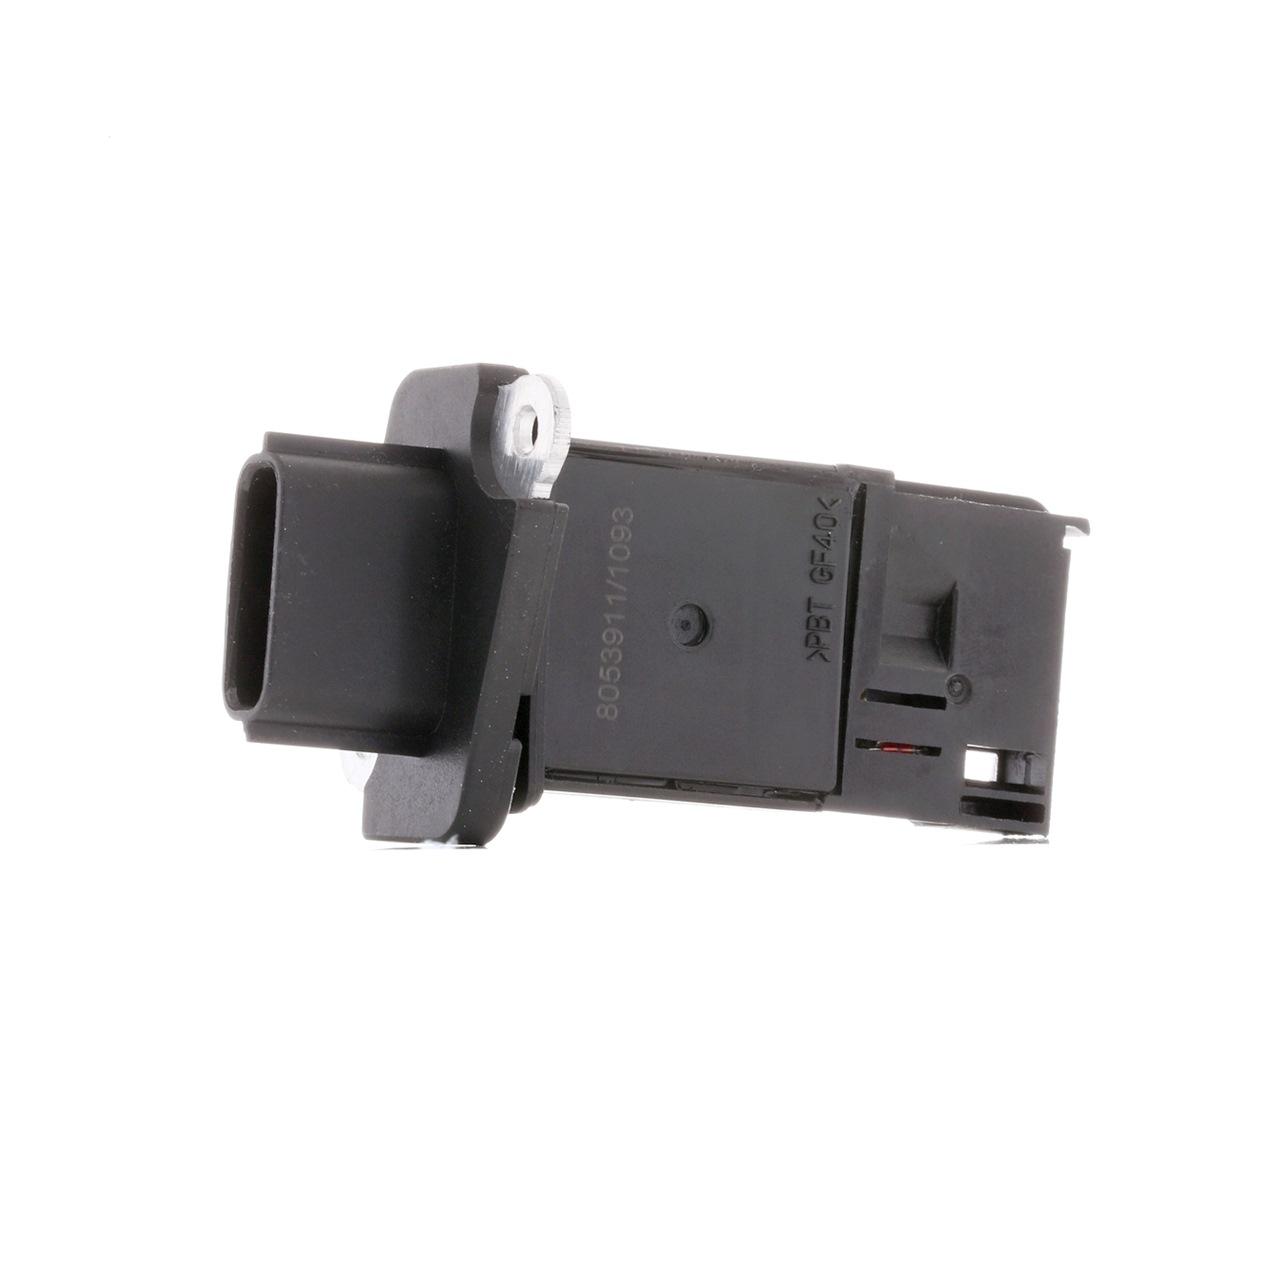 NISSAN PATHFINDER 2020 Steuergeräte, Sensoren, Relais - Original RIDEX 3926A0038 Spannung: 12V